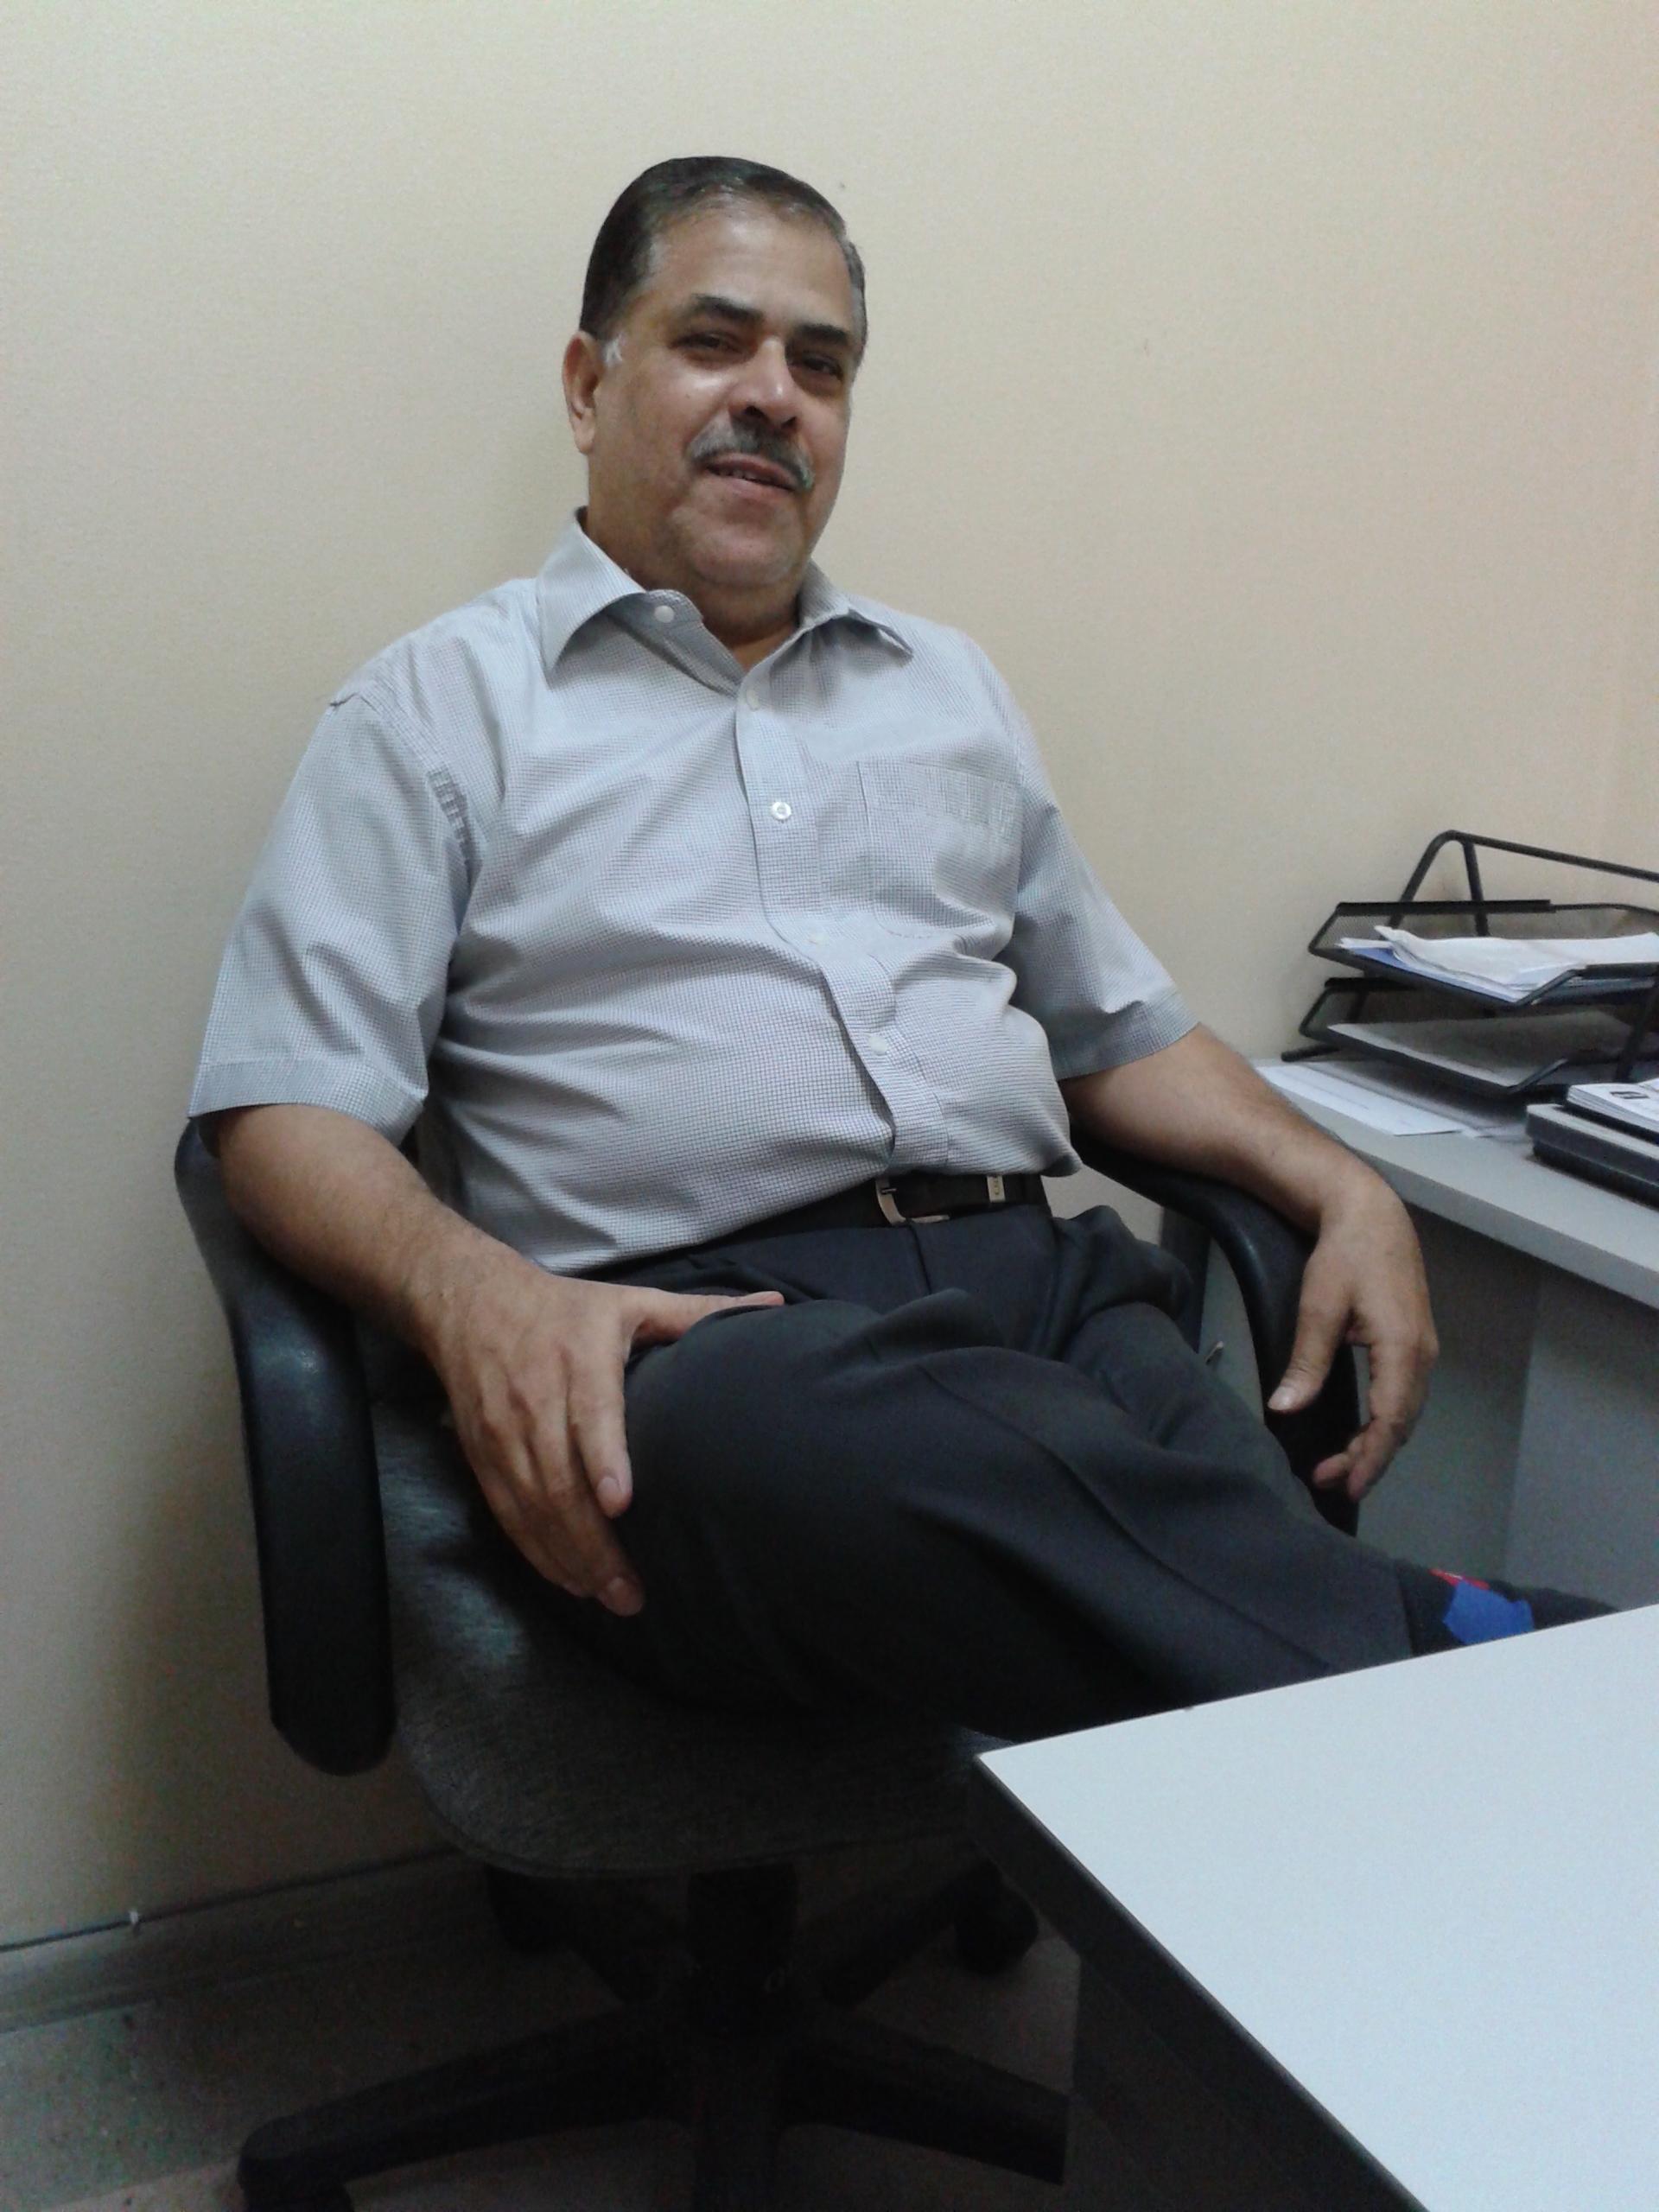 In Salama Hospital, Al Khobar, Saudi Arabia